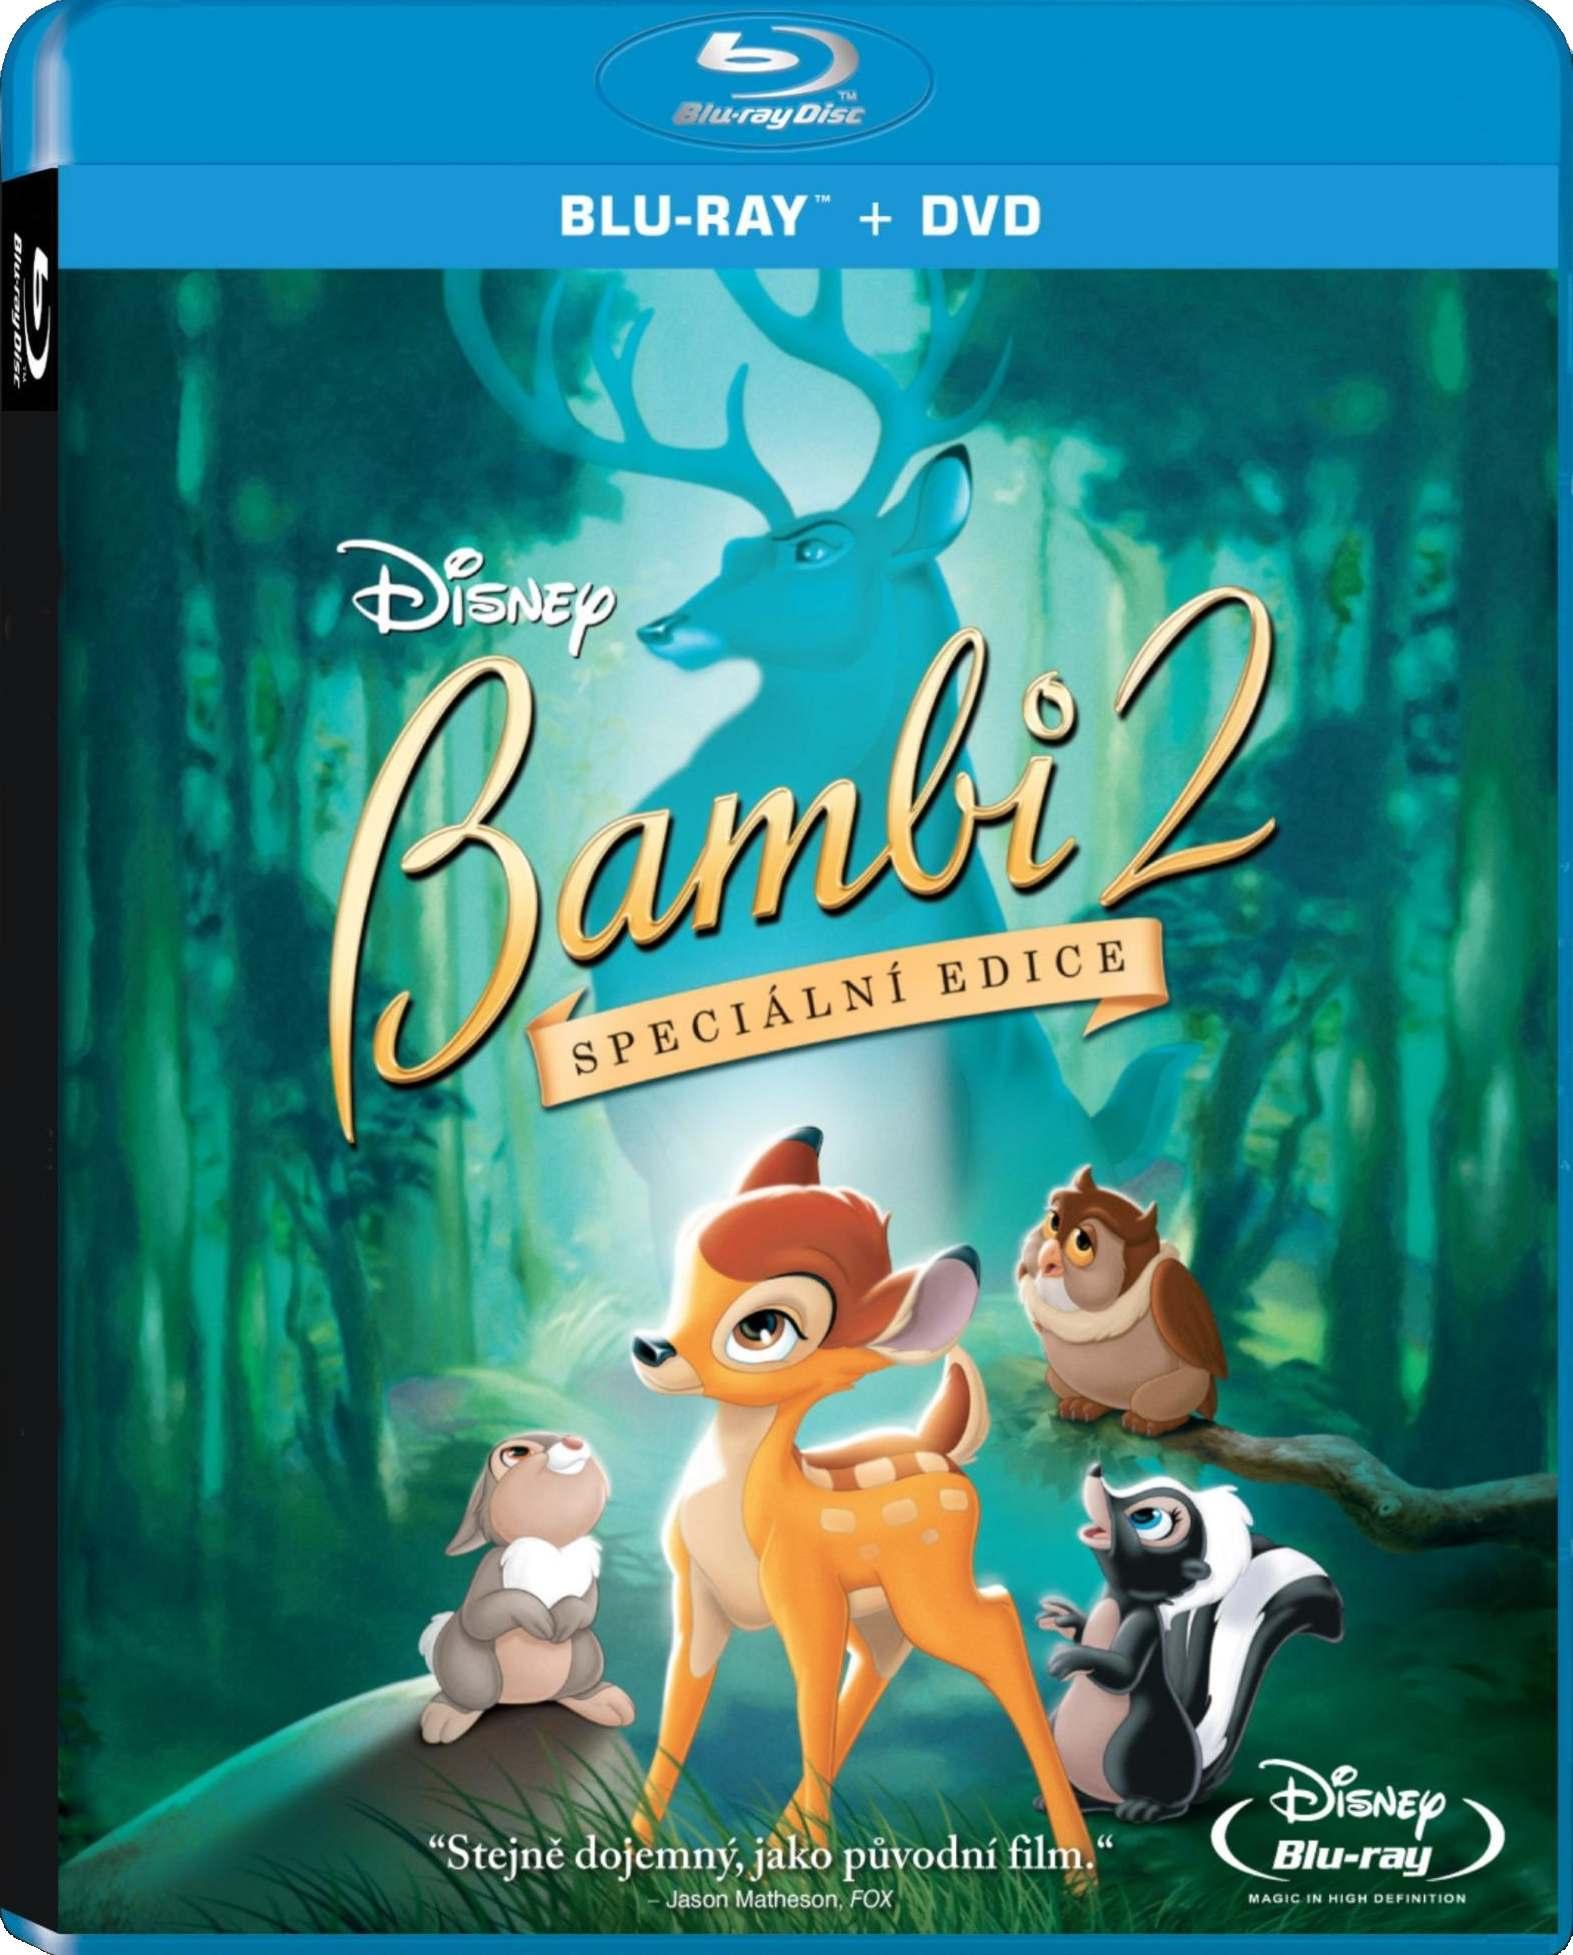 BAMBI 2 - Blu-ray+DVD (Combo pack)